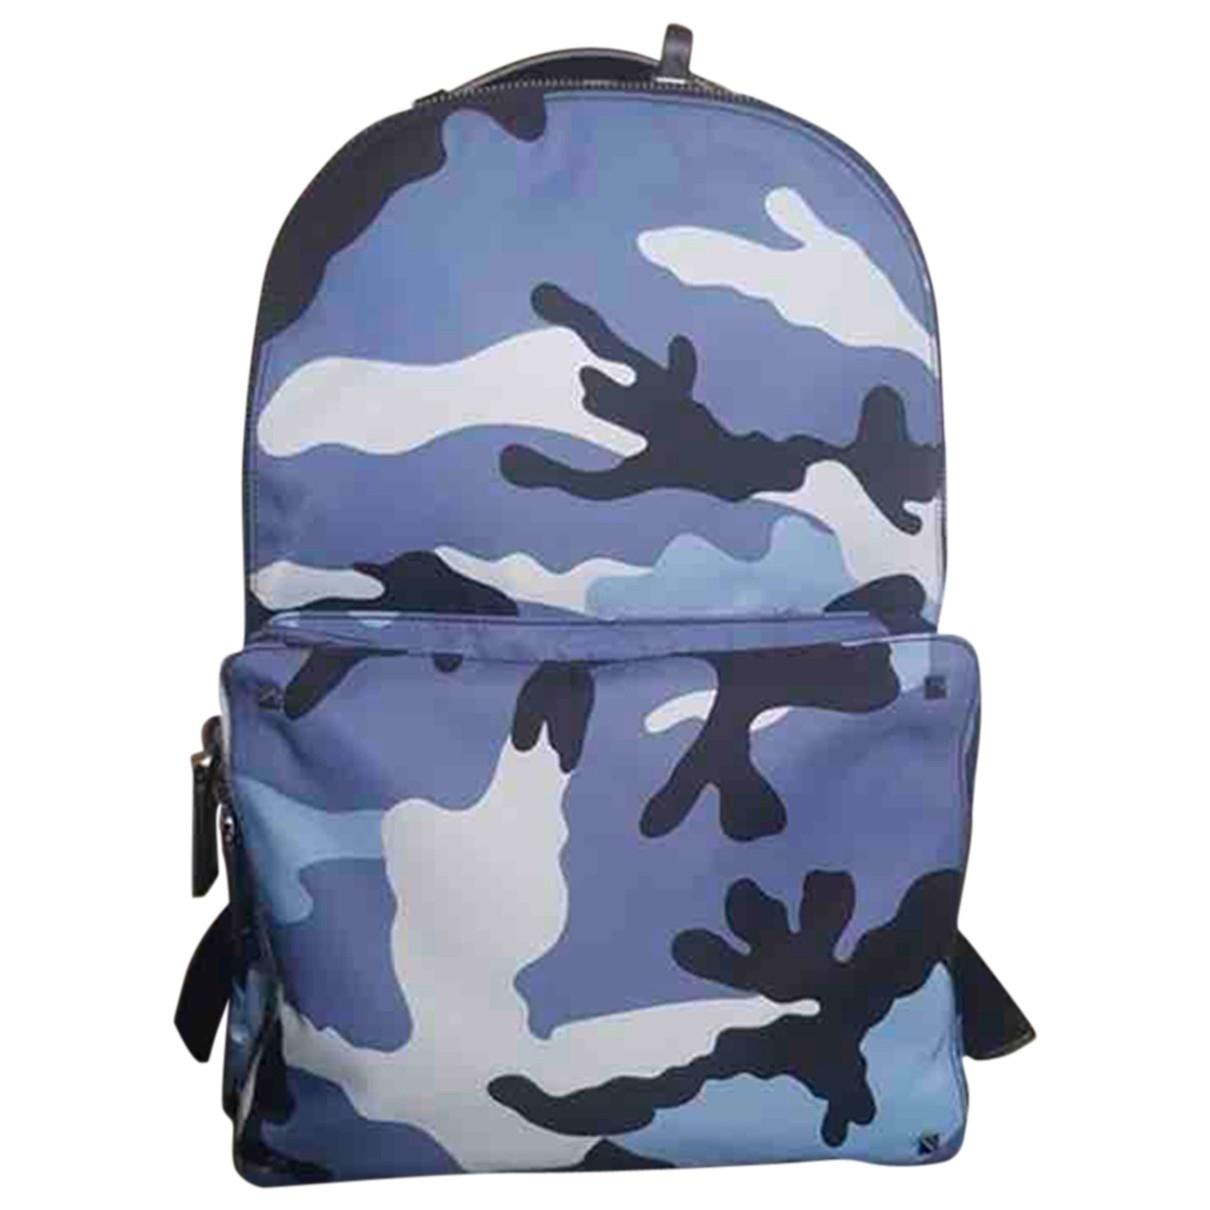 Valentino Garavani \N Blue bag for Men \N